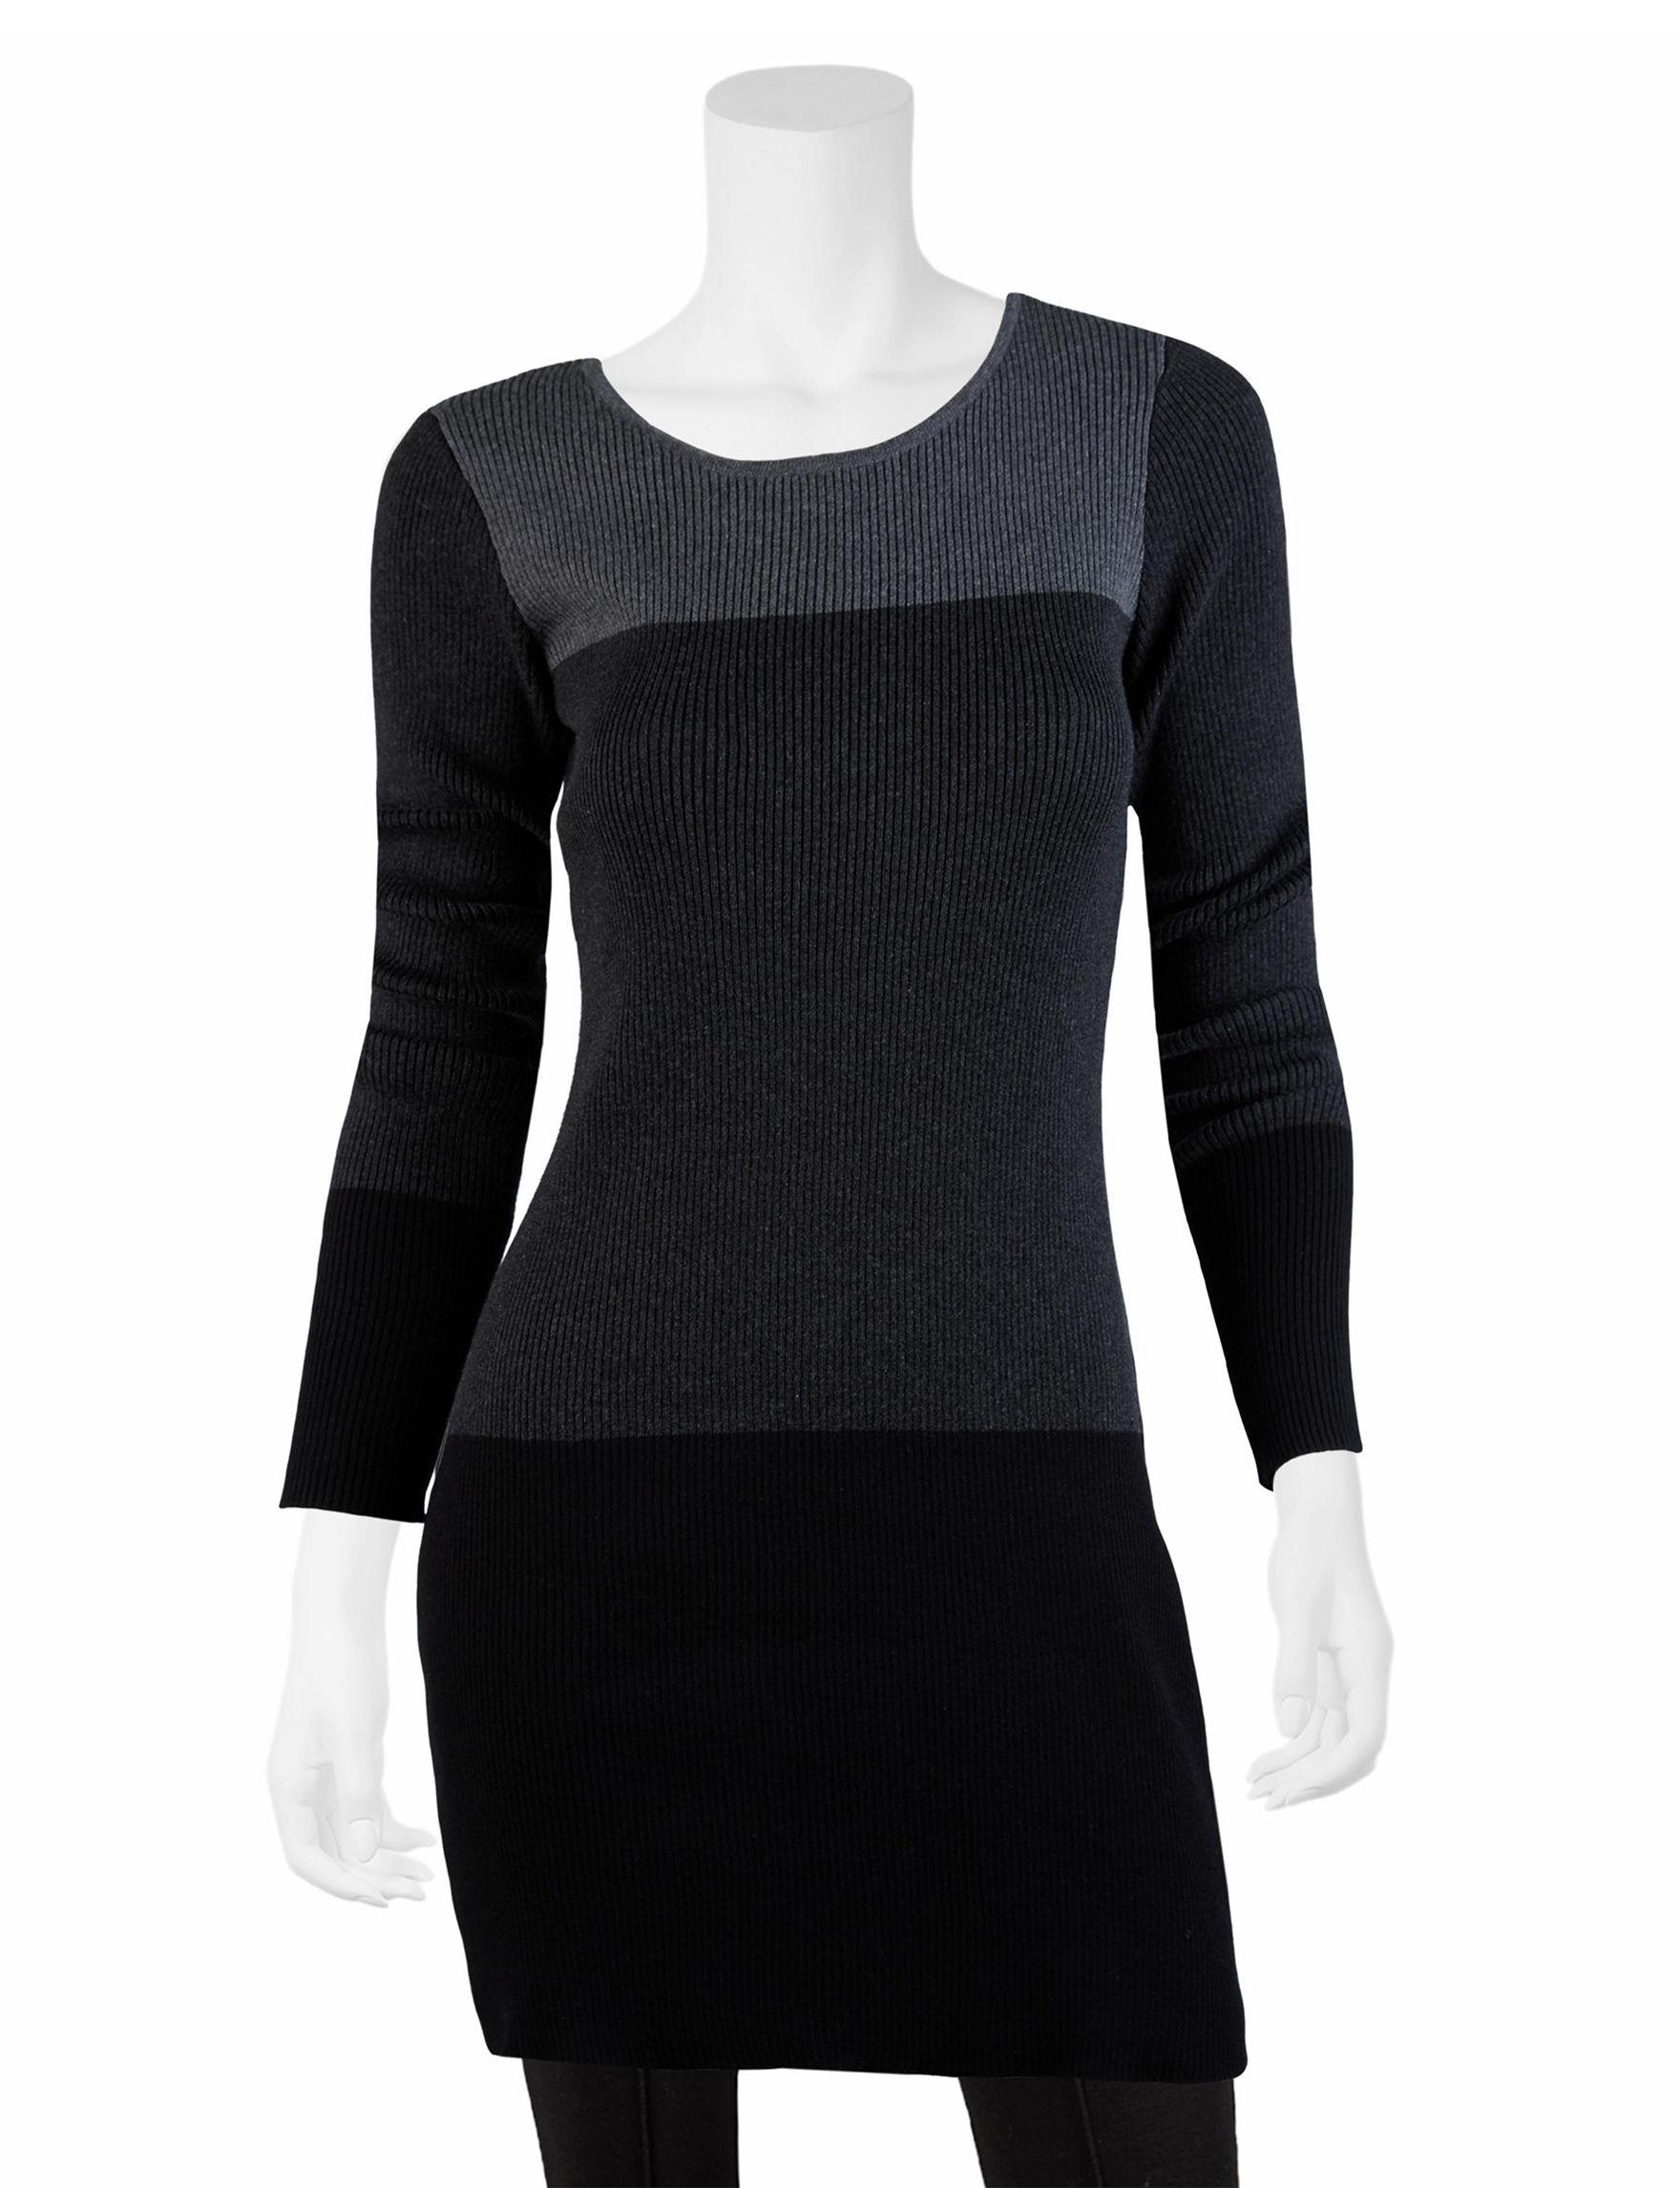 A. Byer Black Sweaters Tunics